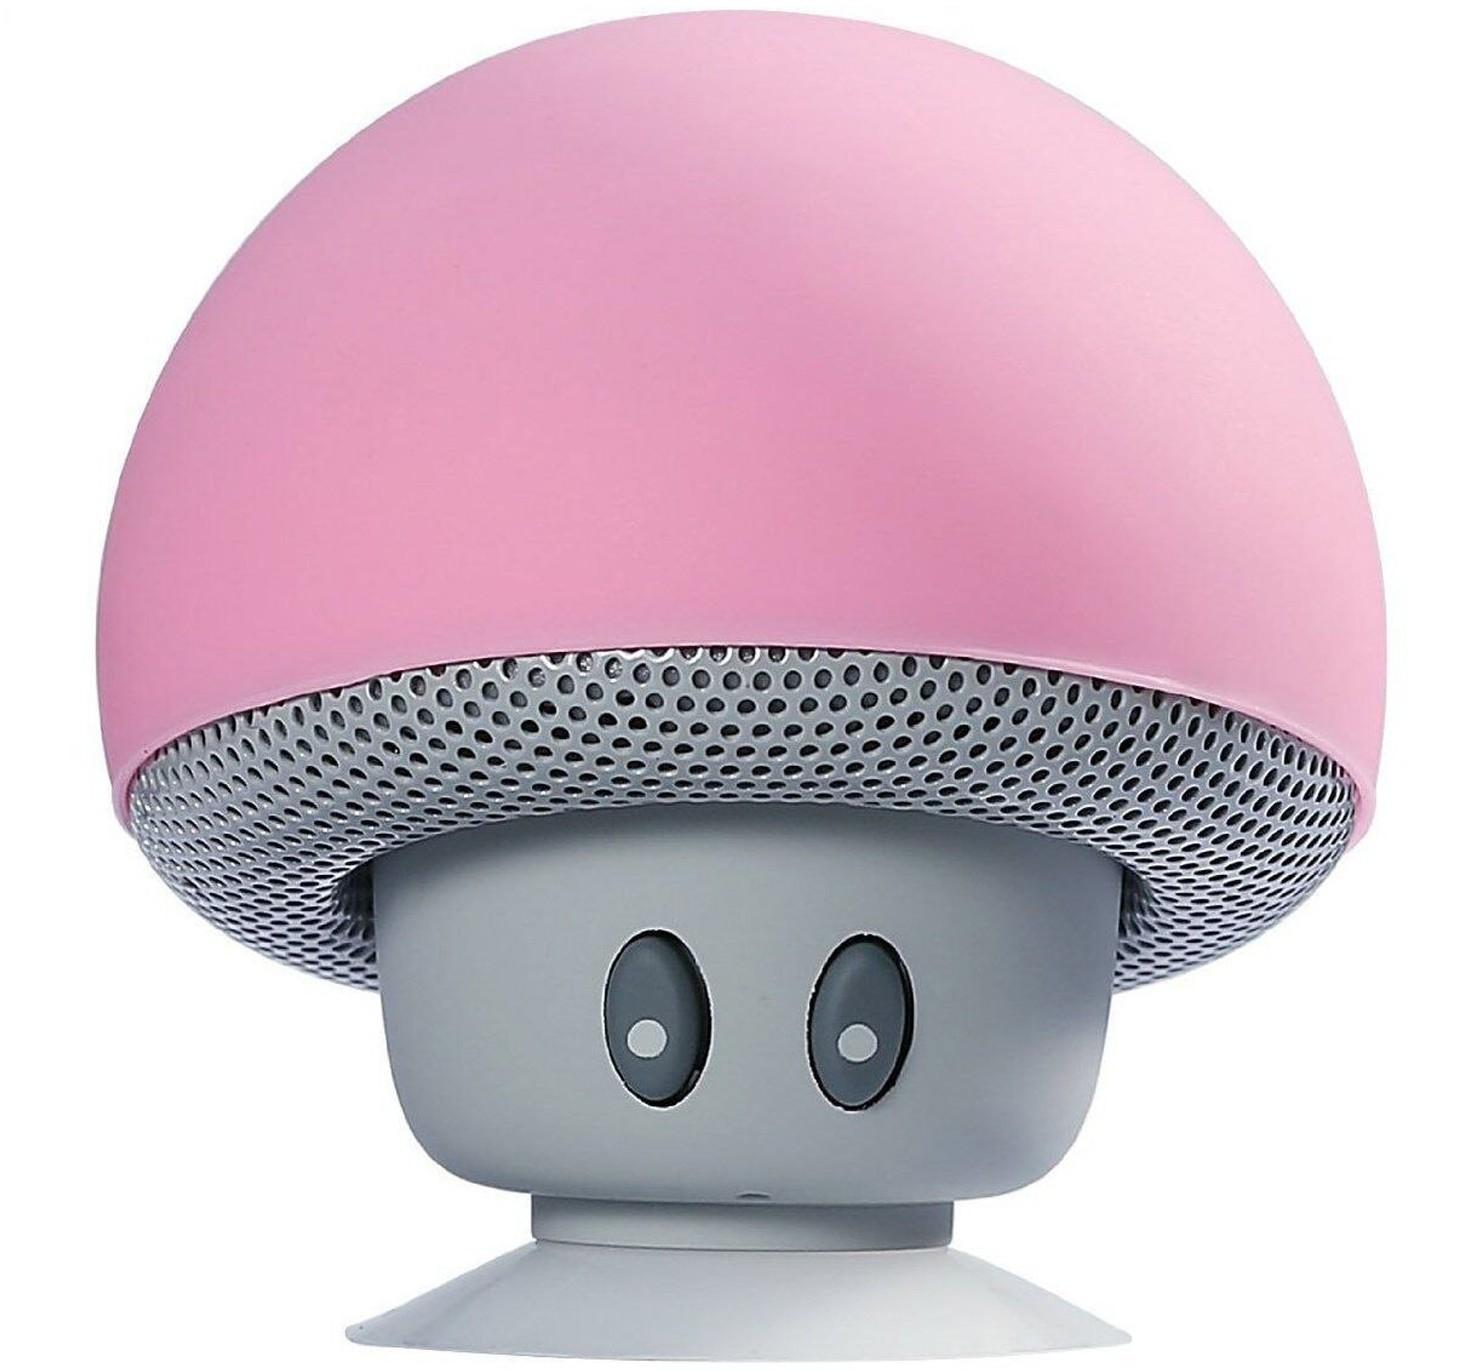 Boxa Portabila Bluetooth iUni DF17, Microfon, Apeluri Handsfree, Roz imagine techstar.ro 2021